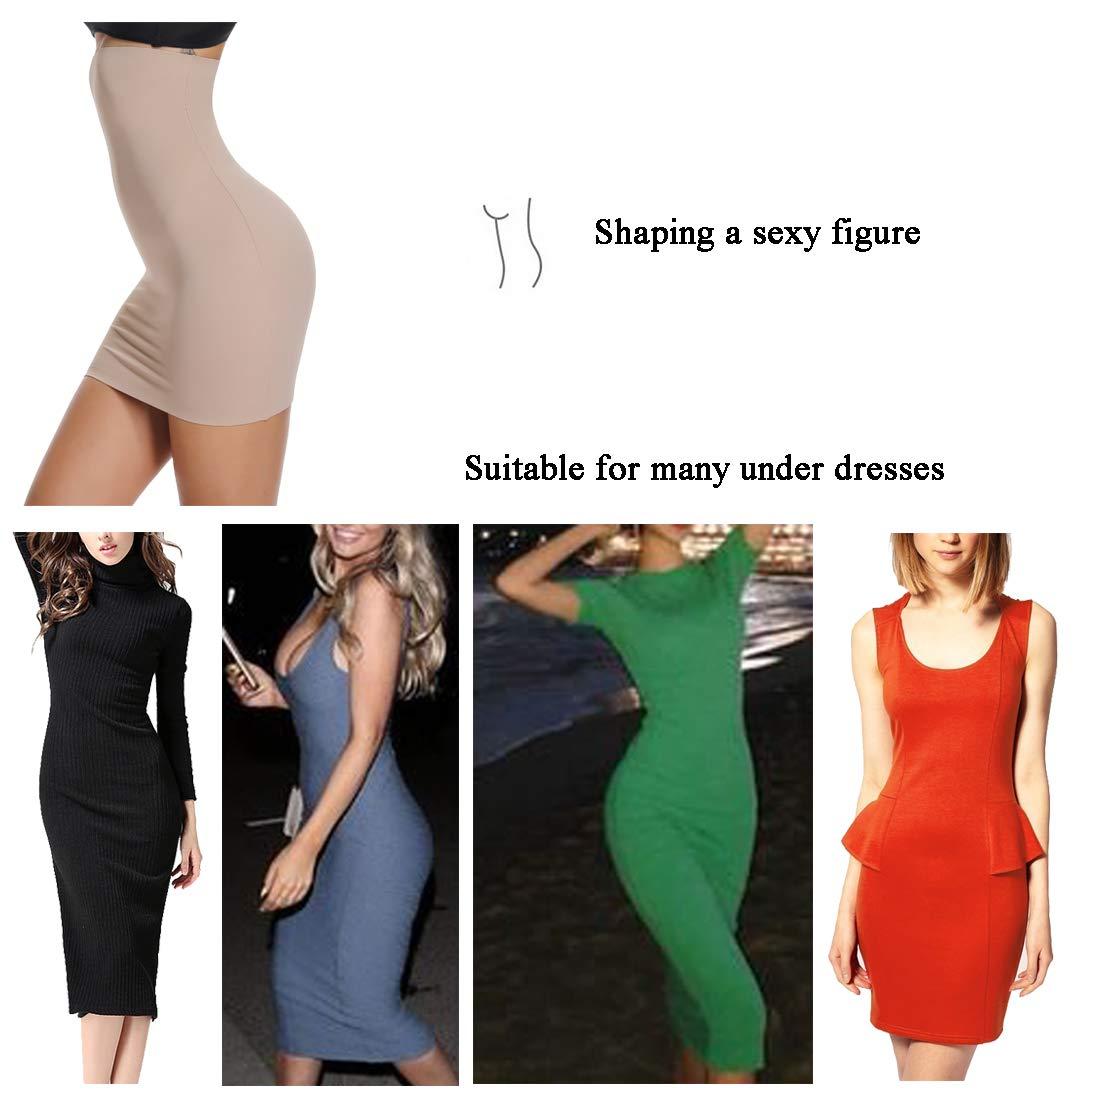 WOWENY Half Slips for Women Under Dress Tummy Control Shapewear Seamless High Waist Slimming Skirts